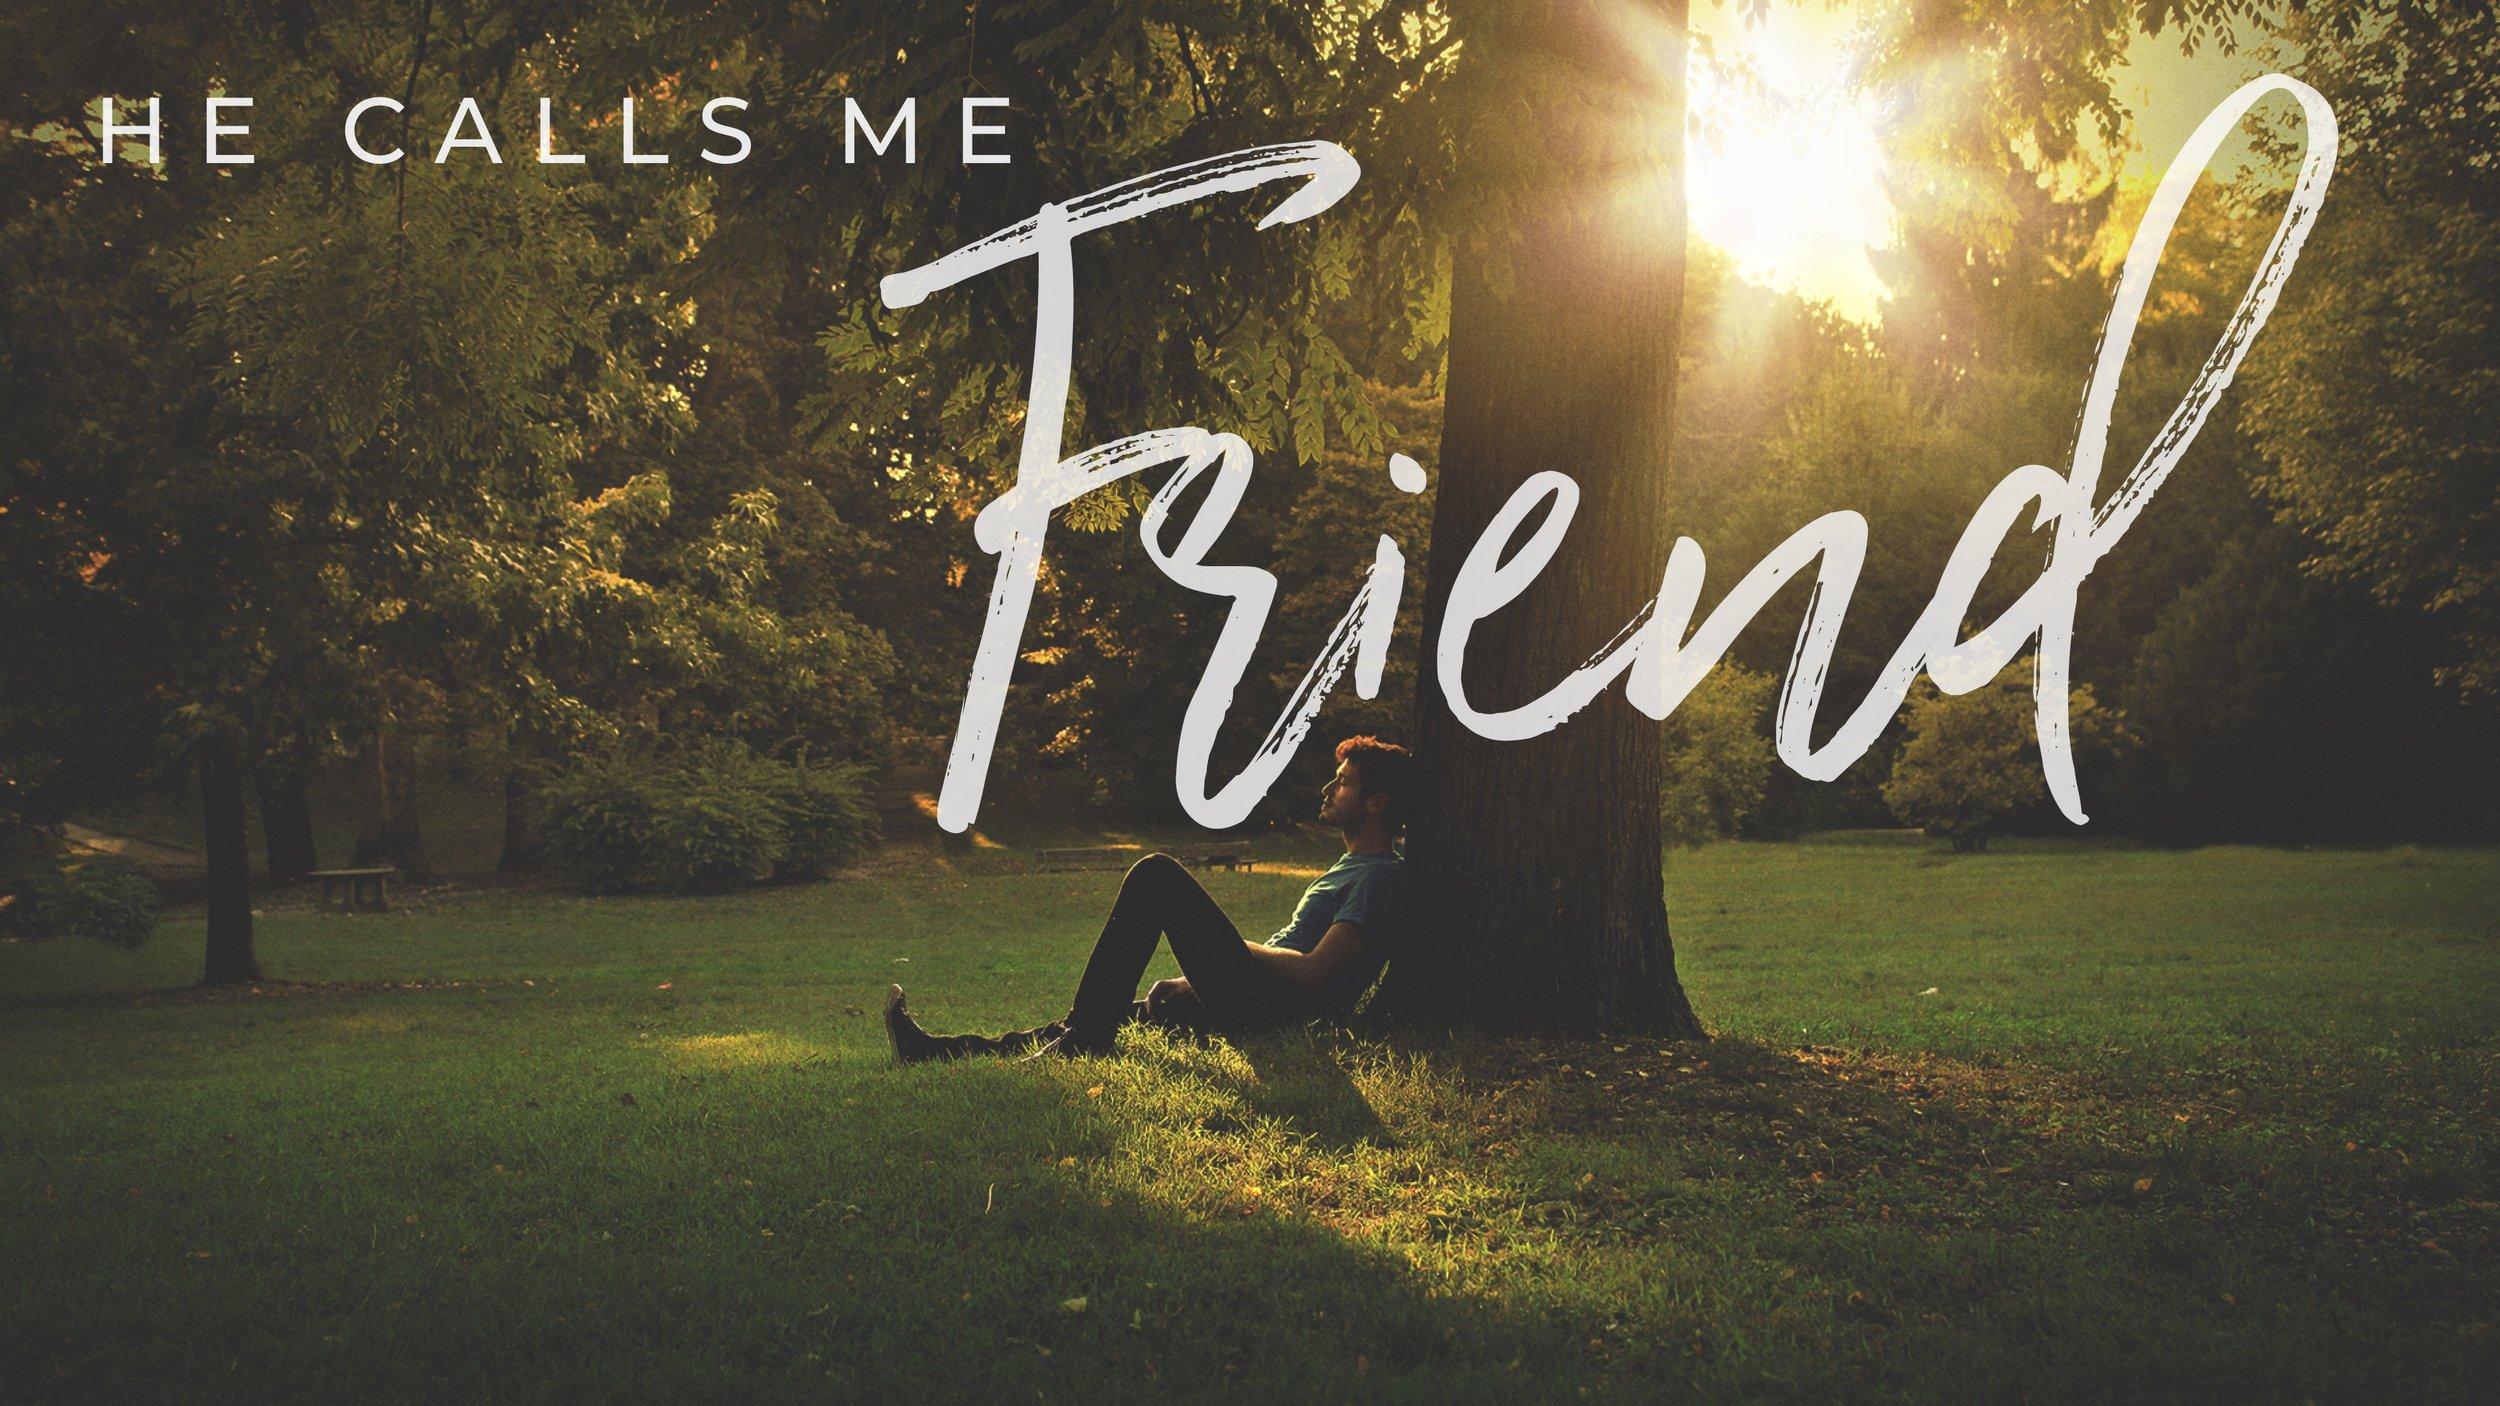 He calls me friend slide.jpg